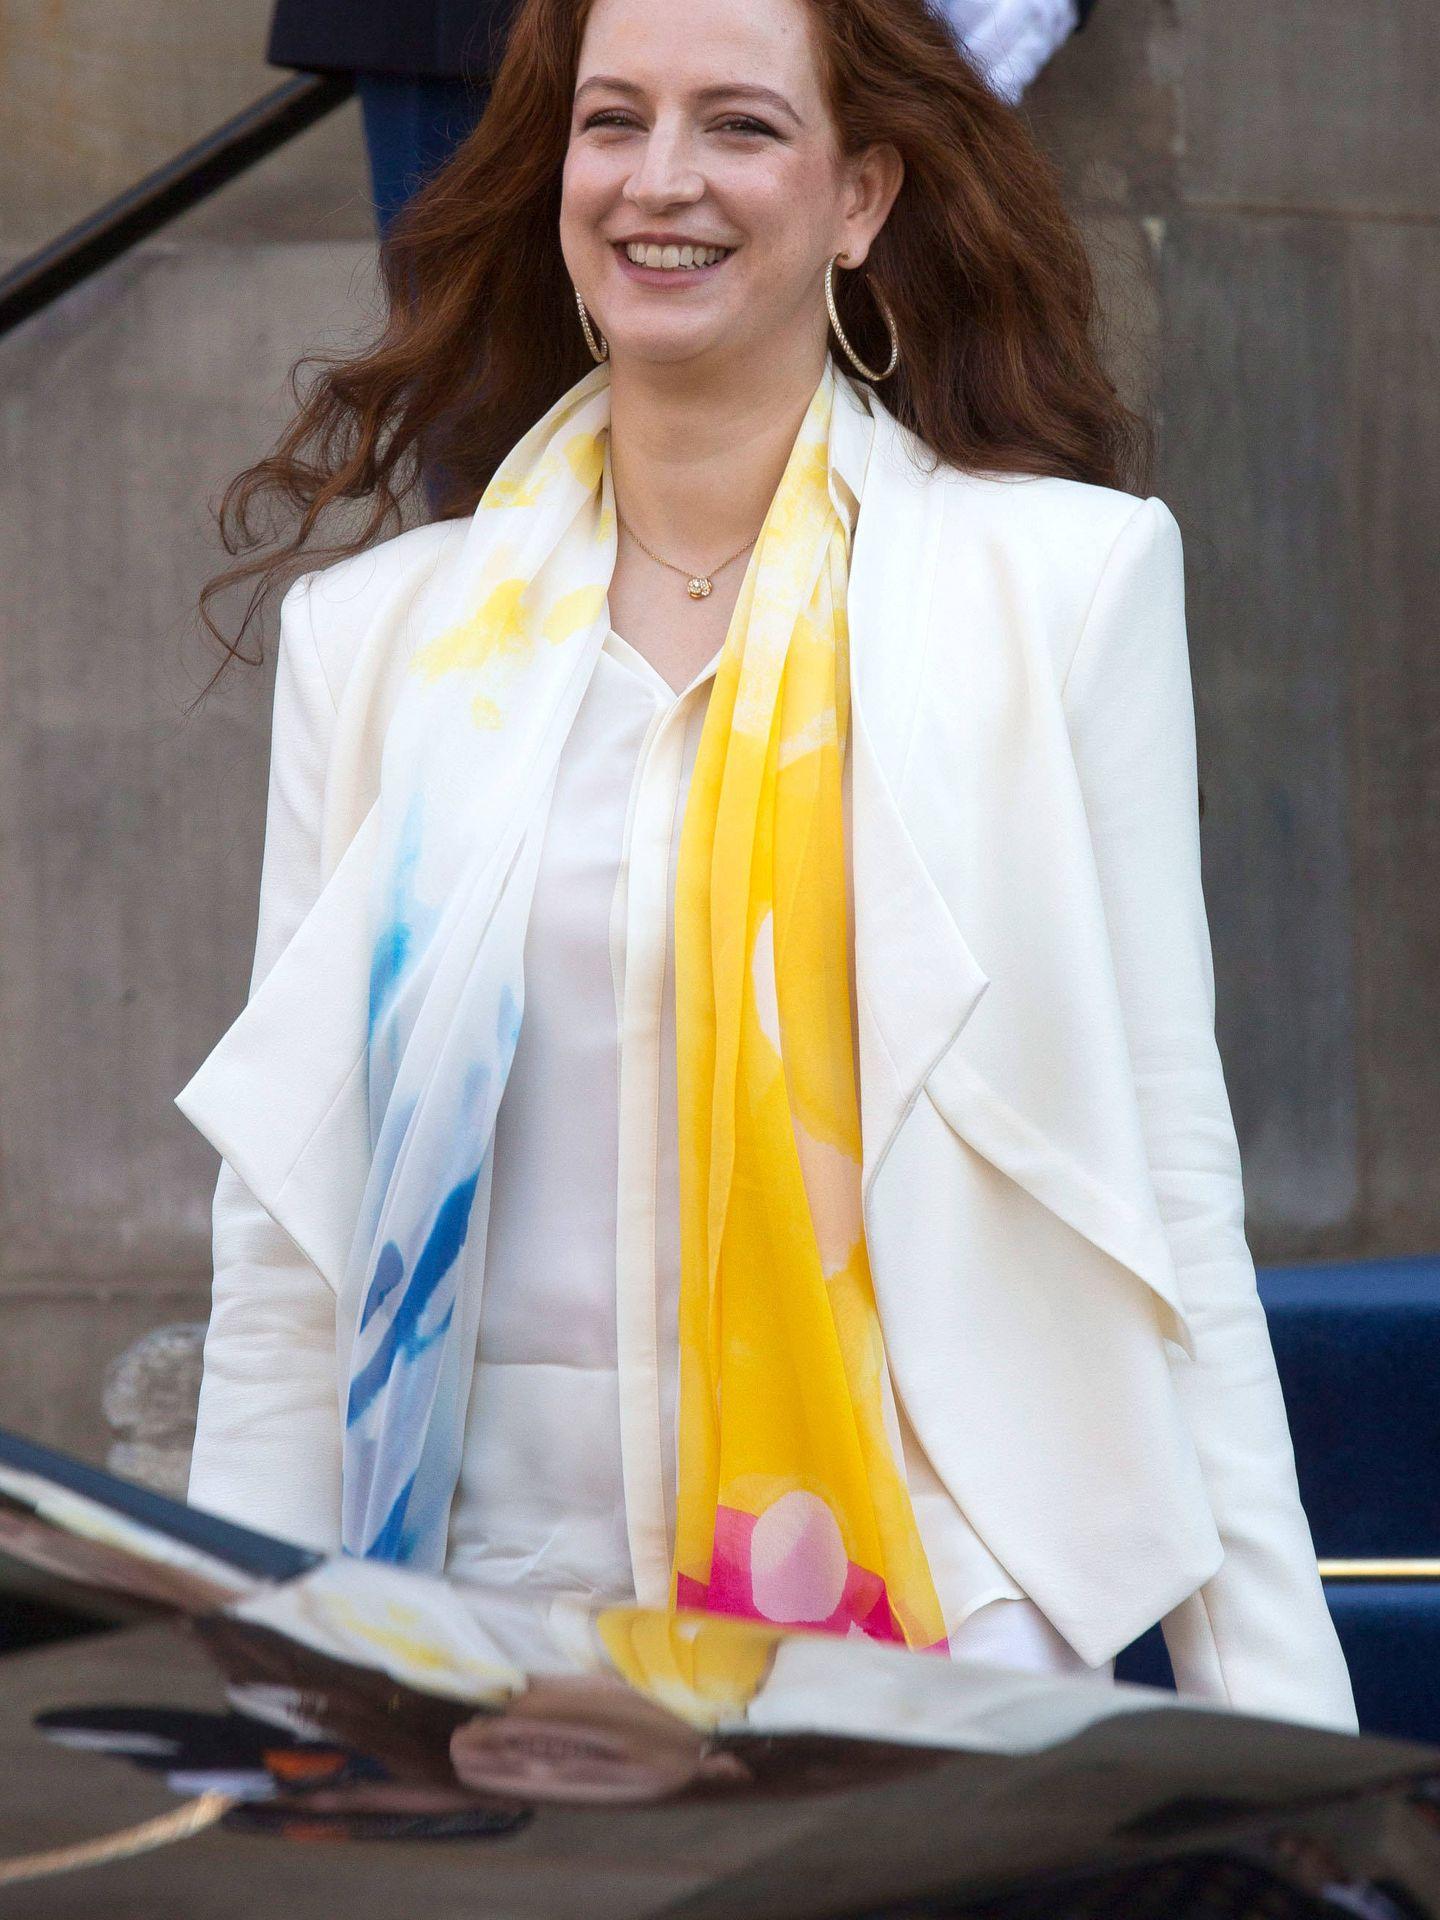 La princesa Salma, una mujer moderna. (Getty)